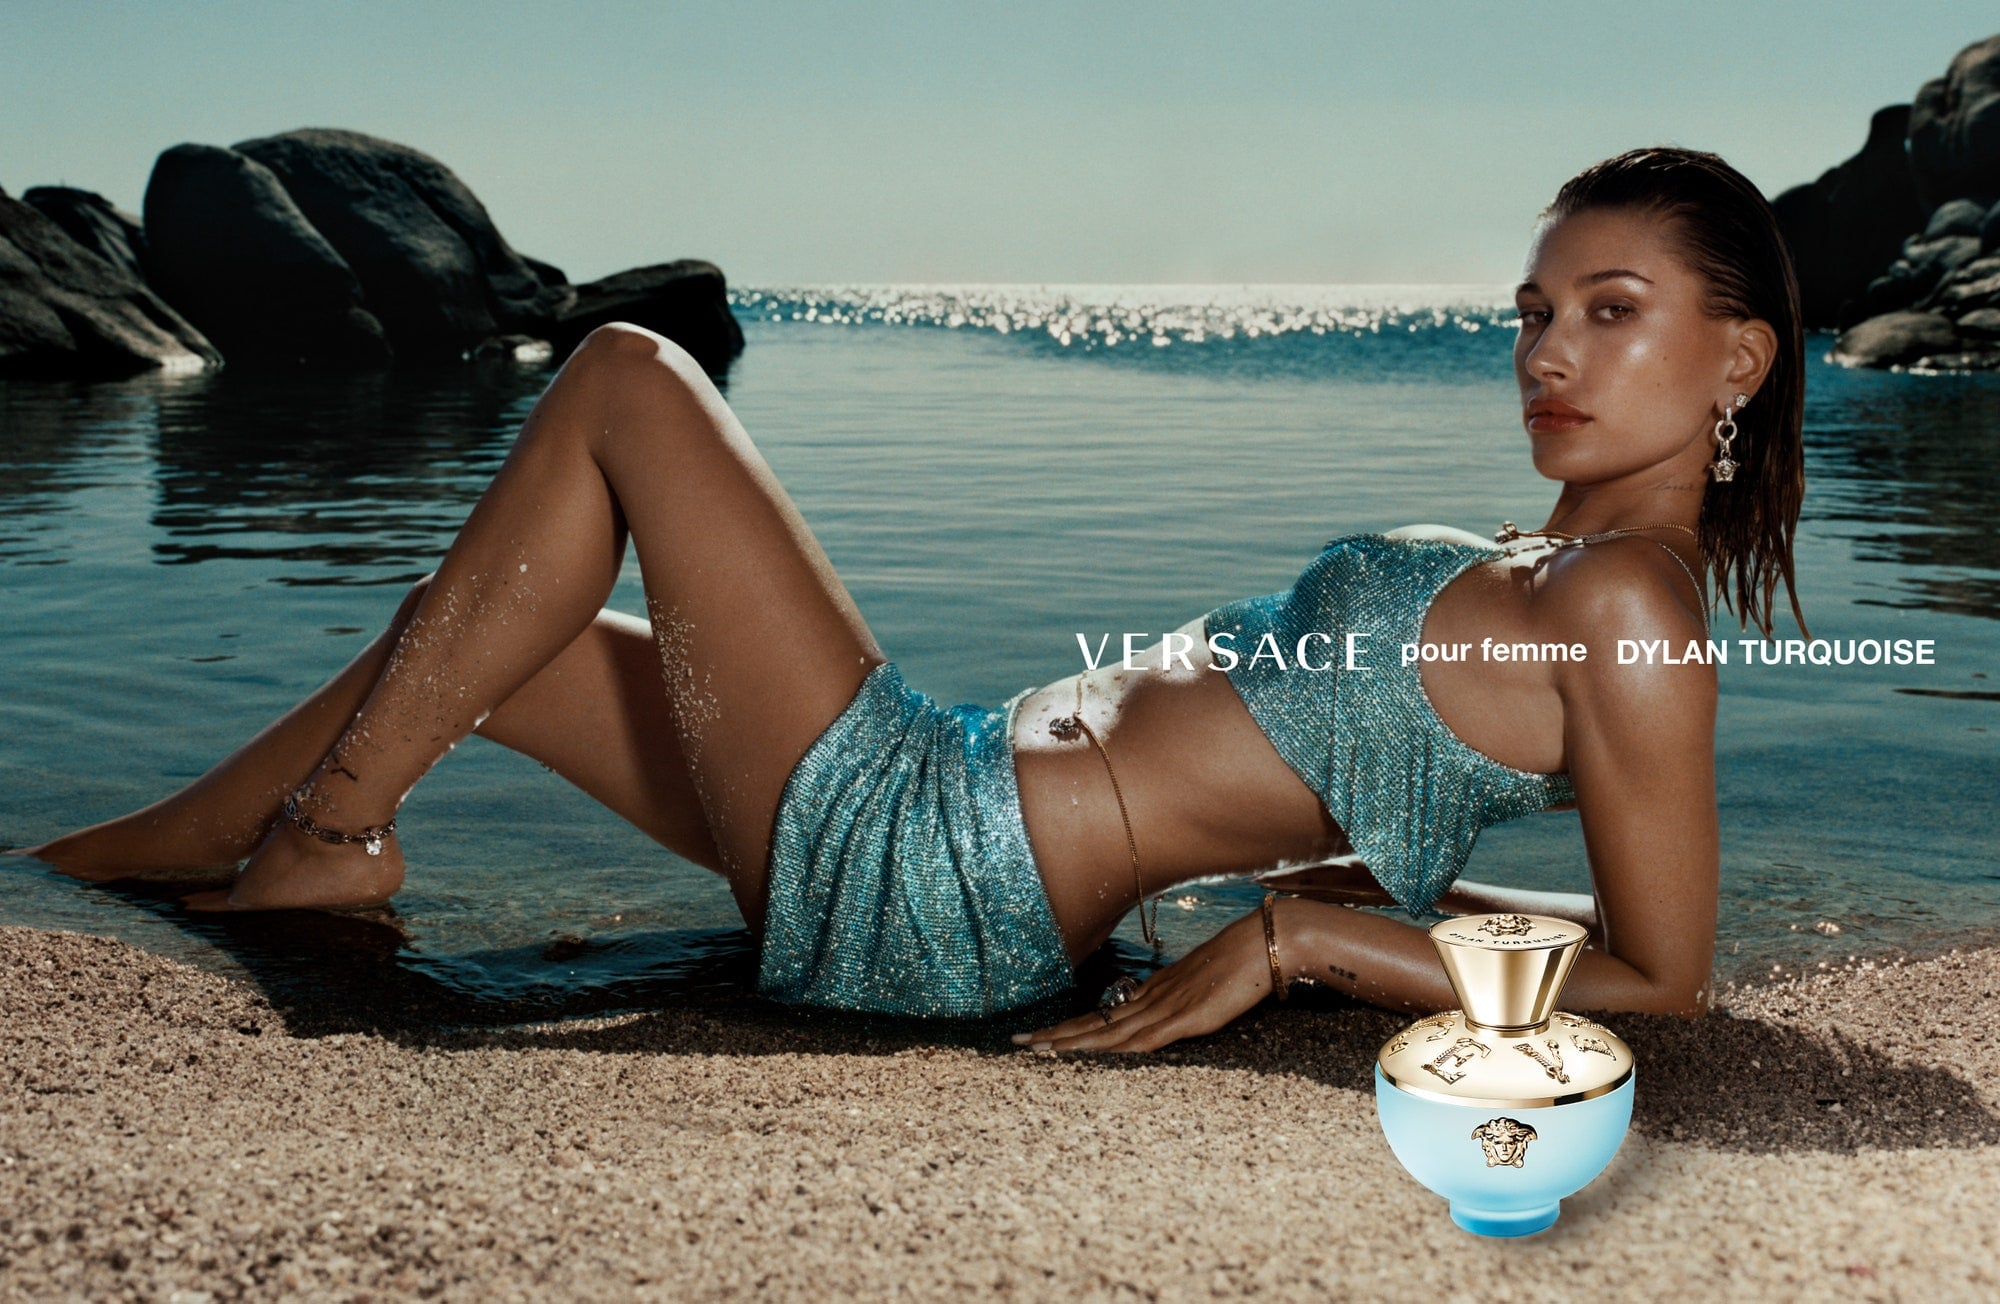 بررسی، مشاهده قیمت و خرید عطر (ادکلن) ورساچه دیلن تورکویز پور فمه Versace Dylan Turquoise Pour Femme اصل